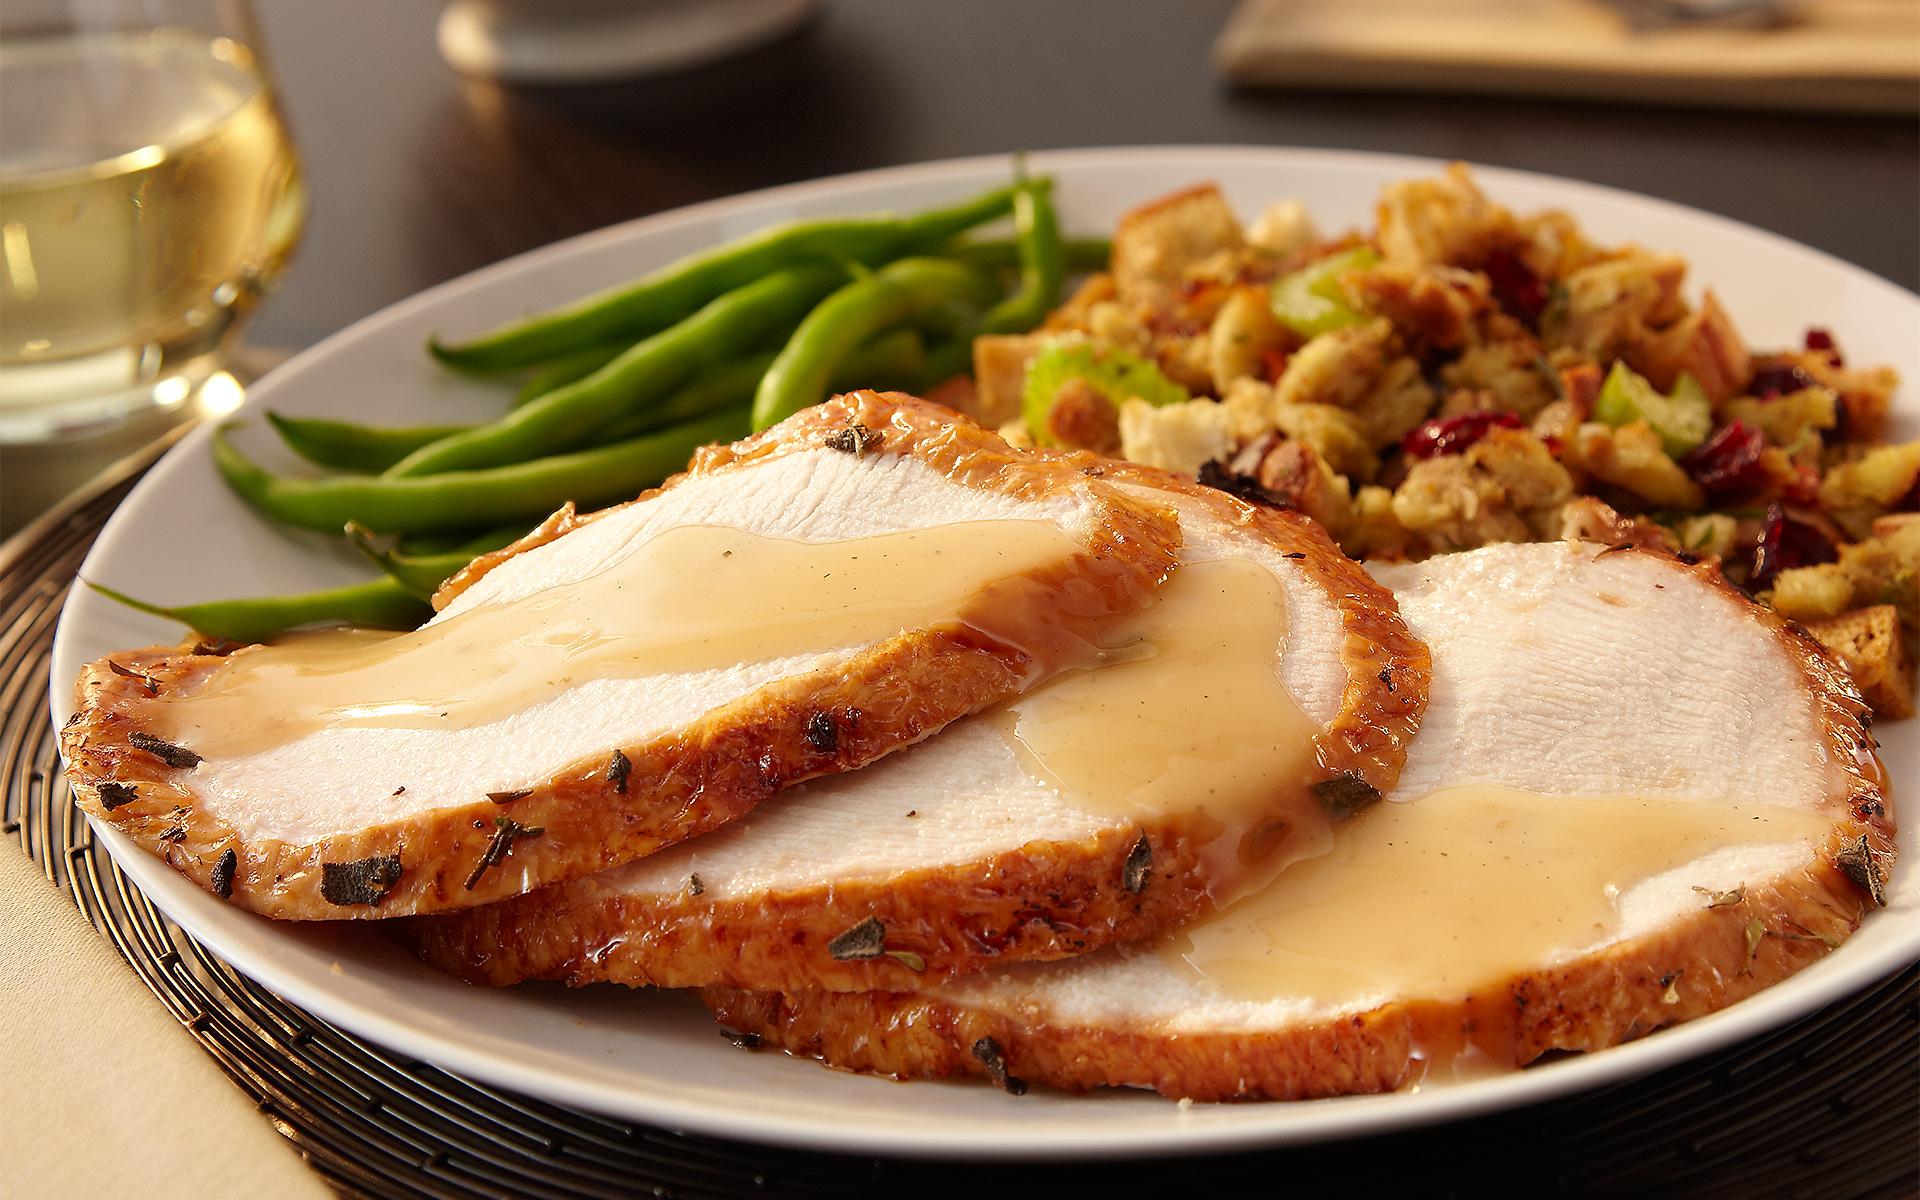 TurkeyShot1_Slices.jpg